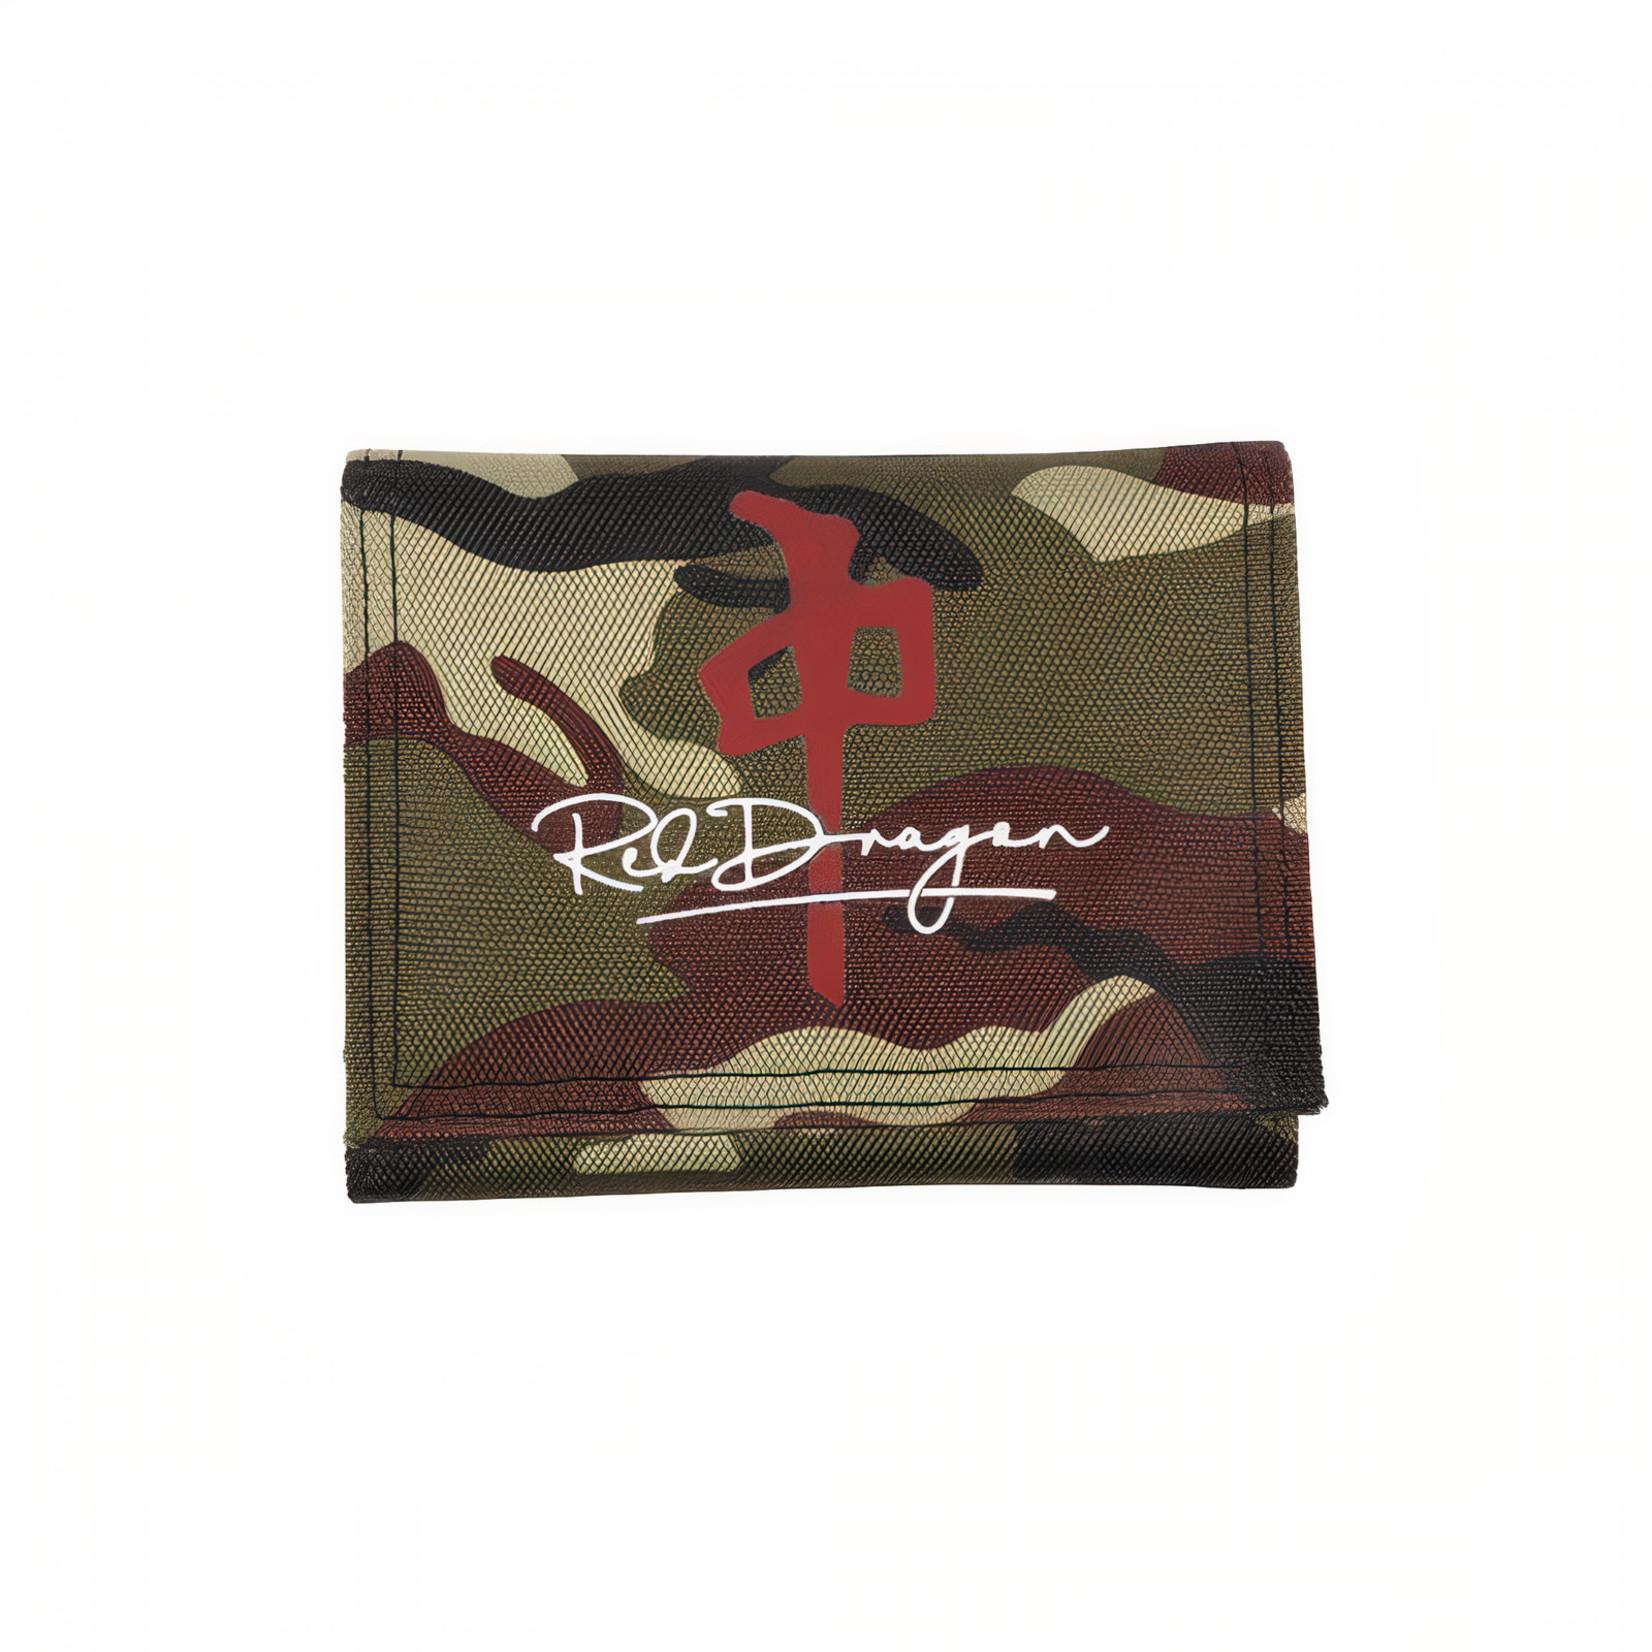 Red Dragon Apparel RDS - Signature Velcro Wallet - Camo